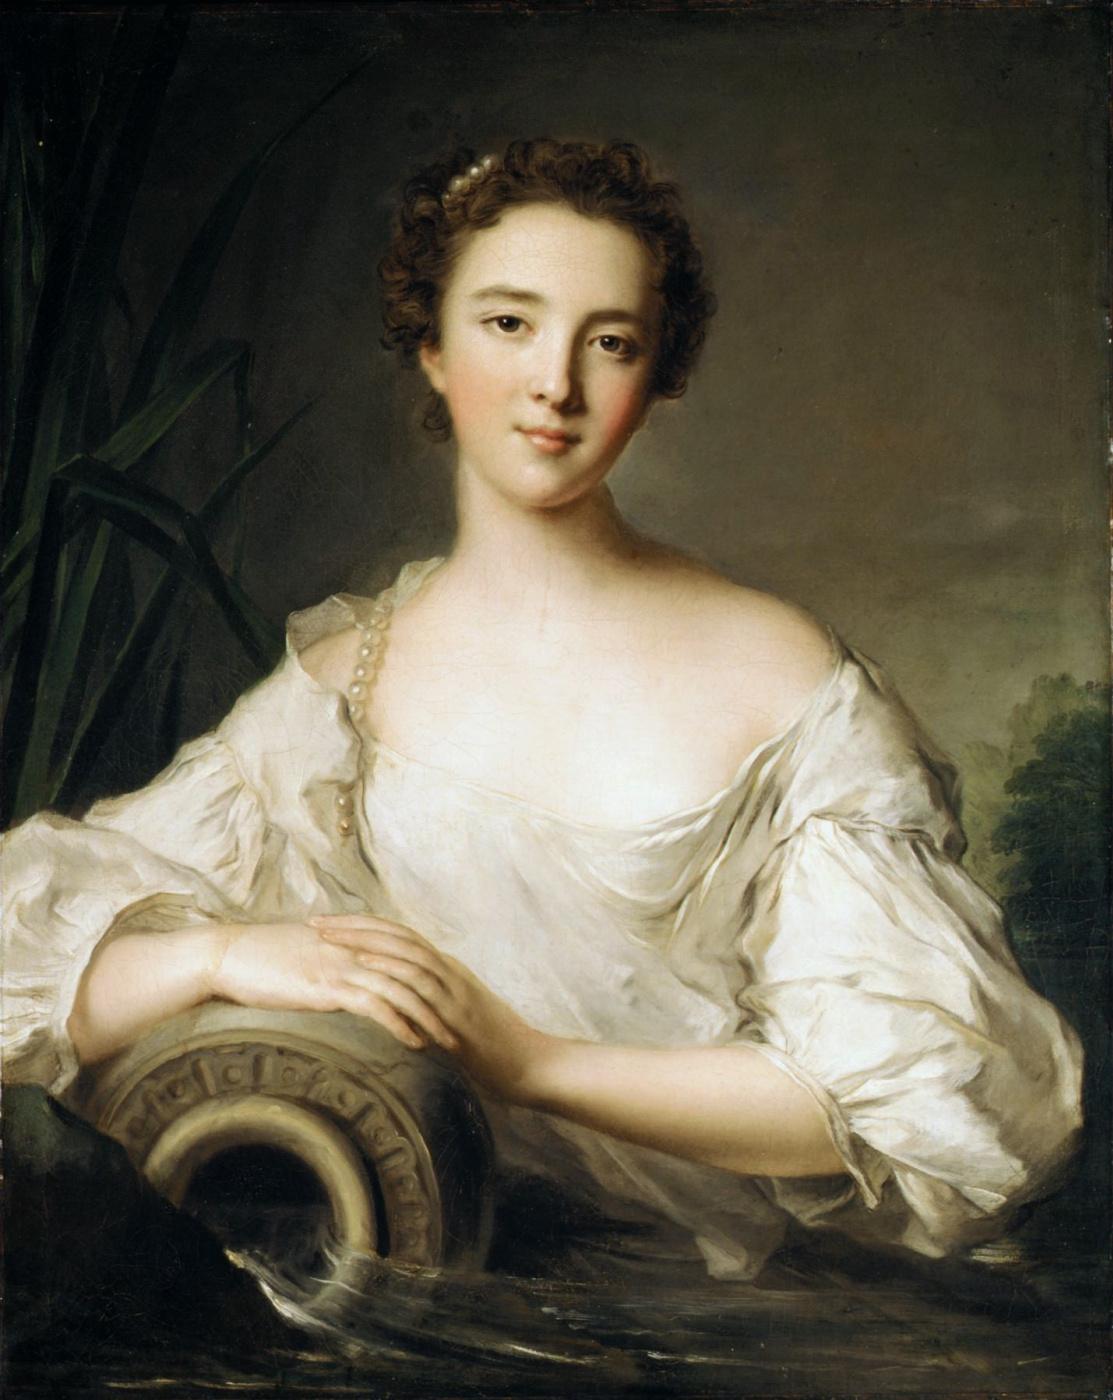 Jean-Marc Nate. Луиза Генриетта де Бурбон-Конти (1726-1759), позже герцогиня Орлеанская